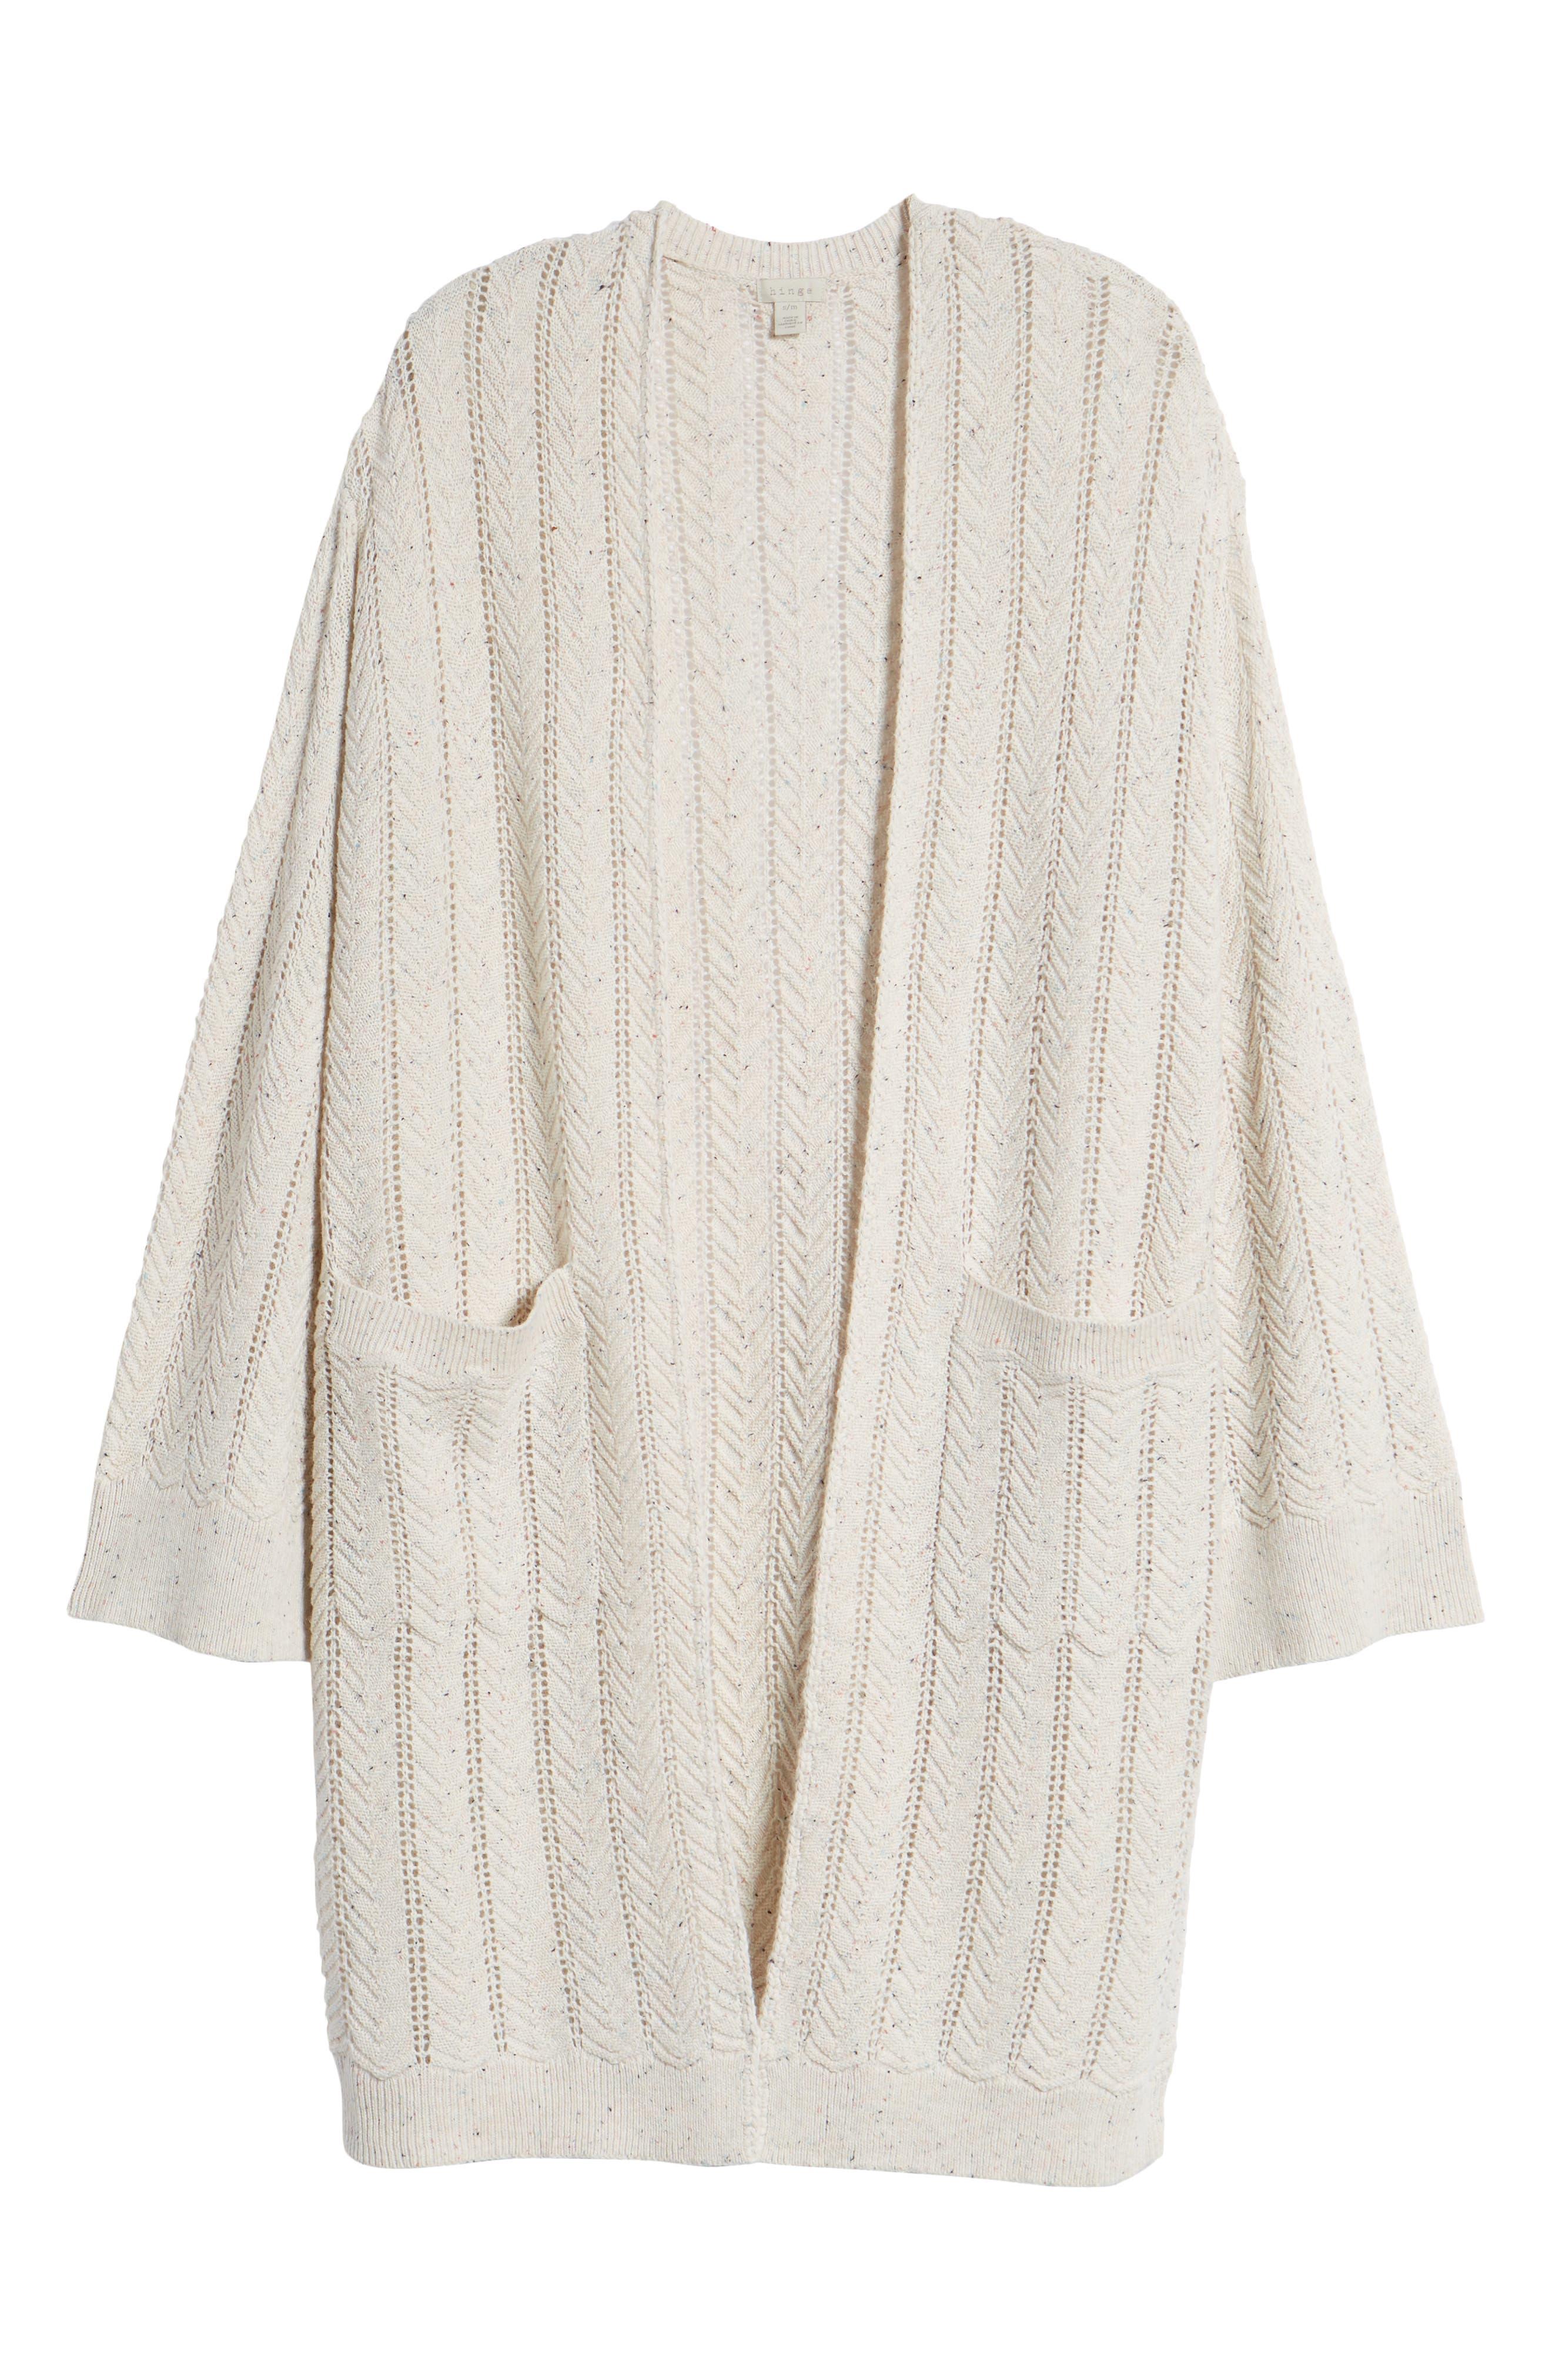 Long Tweed Herringbone Stitch Cardigan,                             Alternate thumbnail 6, color,                             Beige Oatmeal Heather